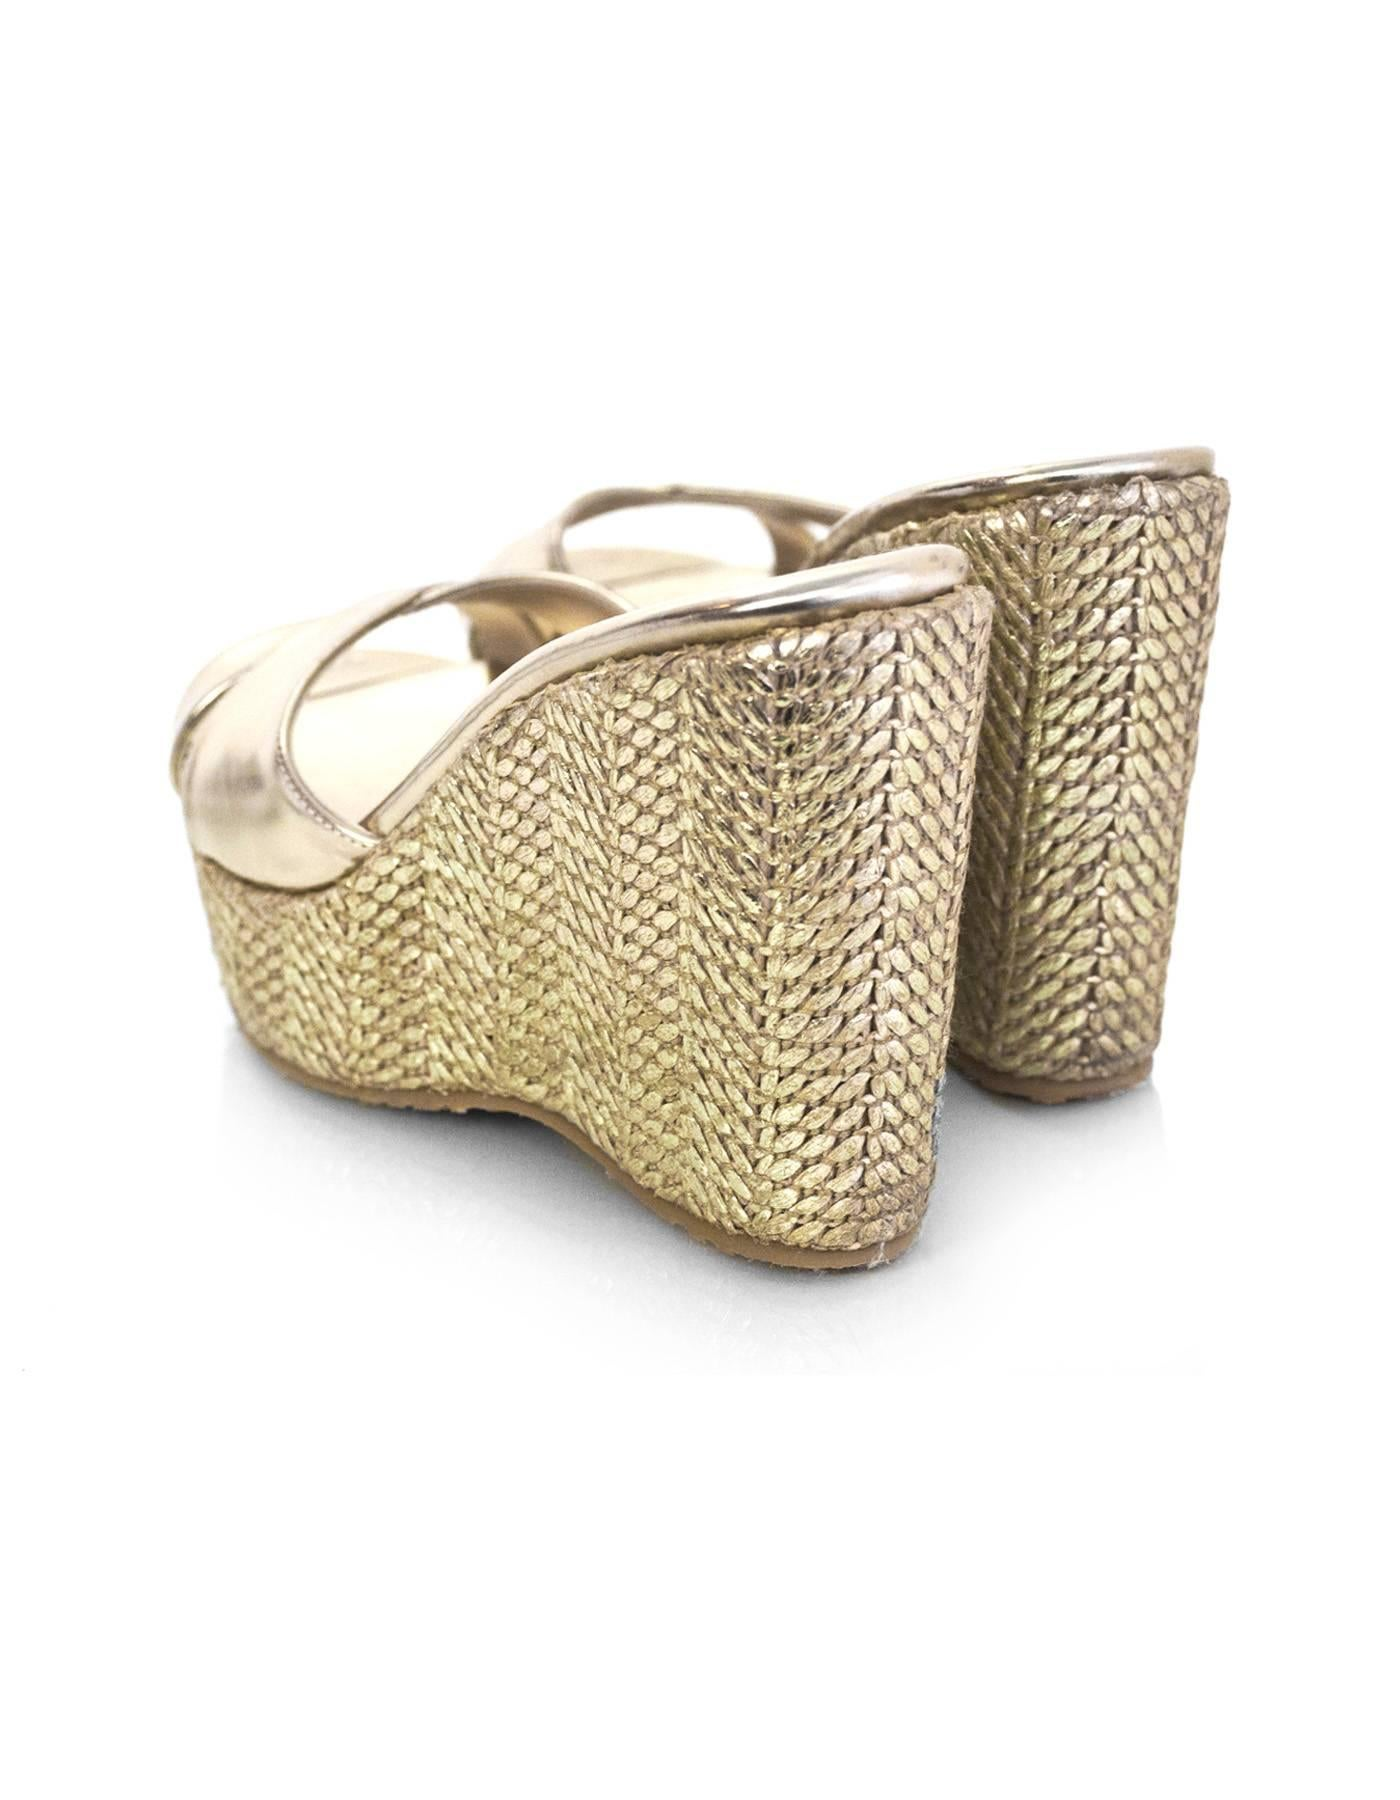 37b580cb12a ... germany womens jimmy choo gold metallic criss cross perfume woven  wedges sz 37 rt. 450